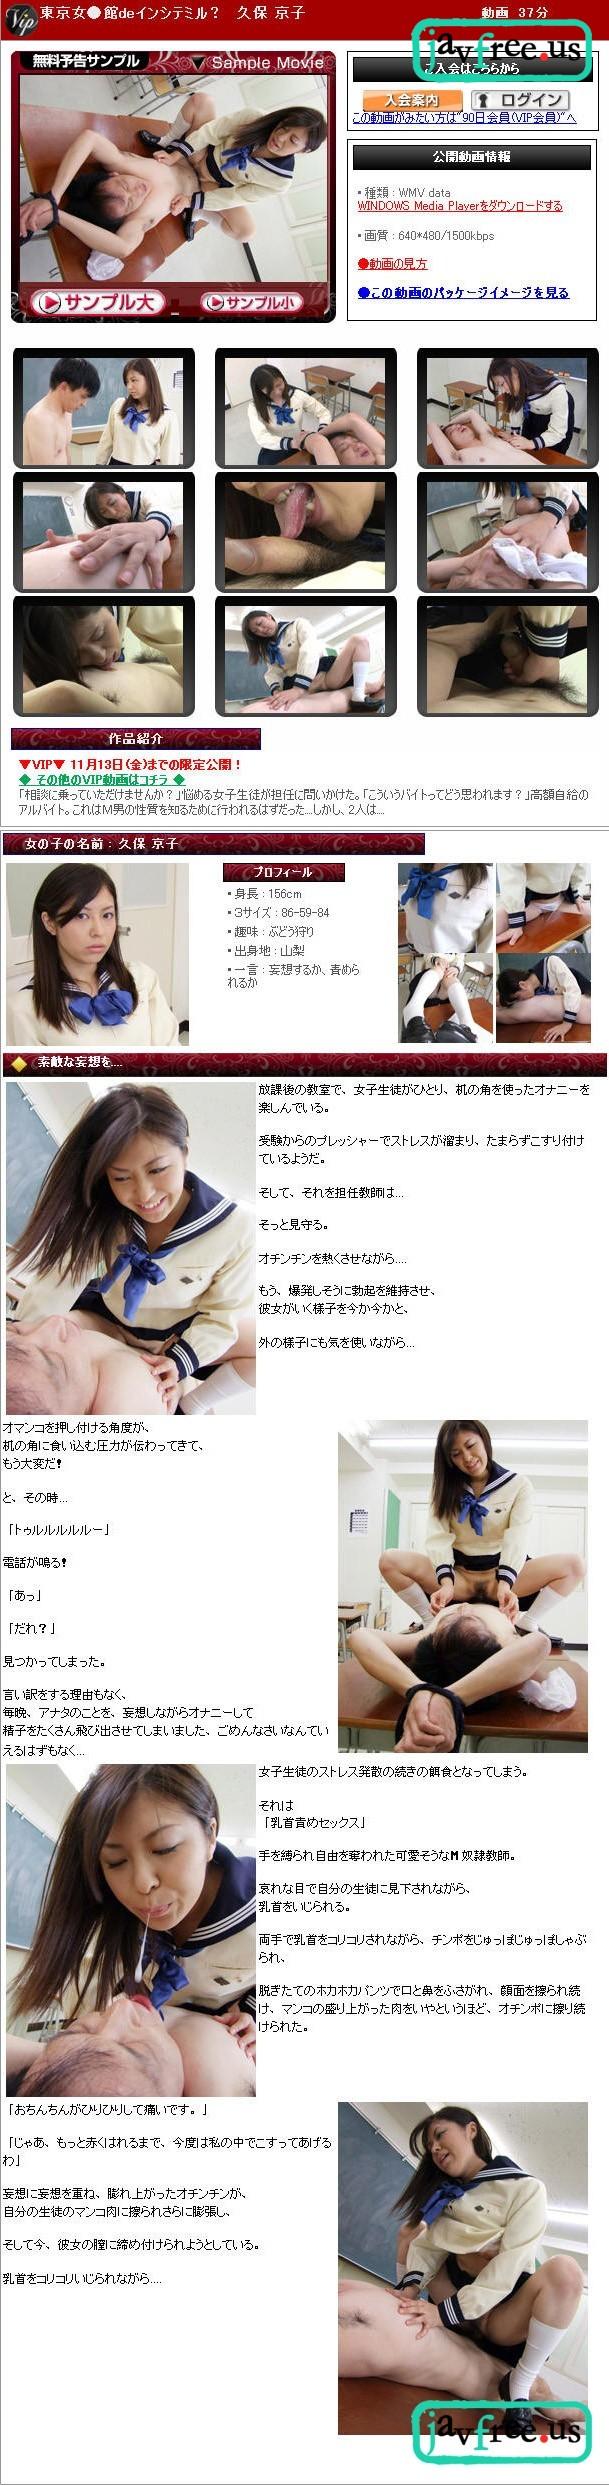 Roselip 0383 東京女●館deインシテミル? 久保京子 - image  on https://javfree.me